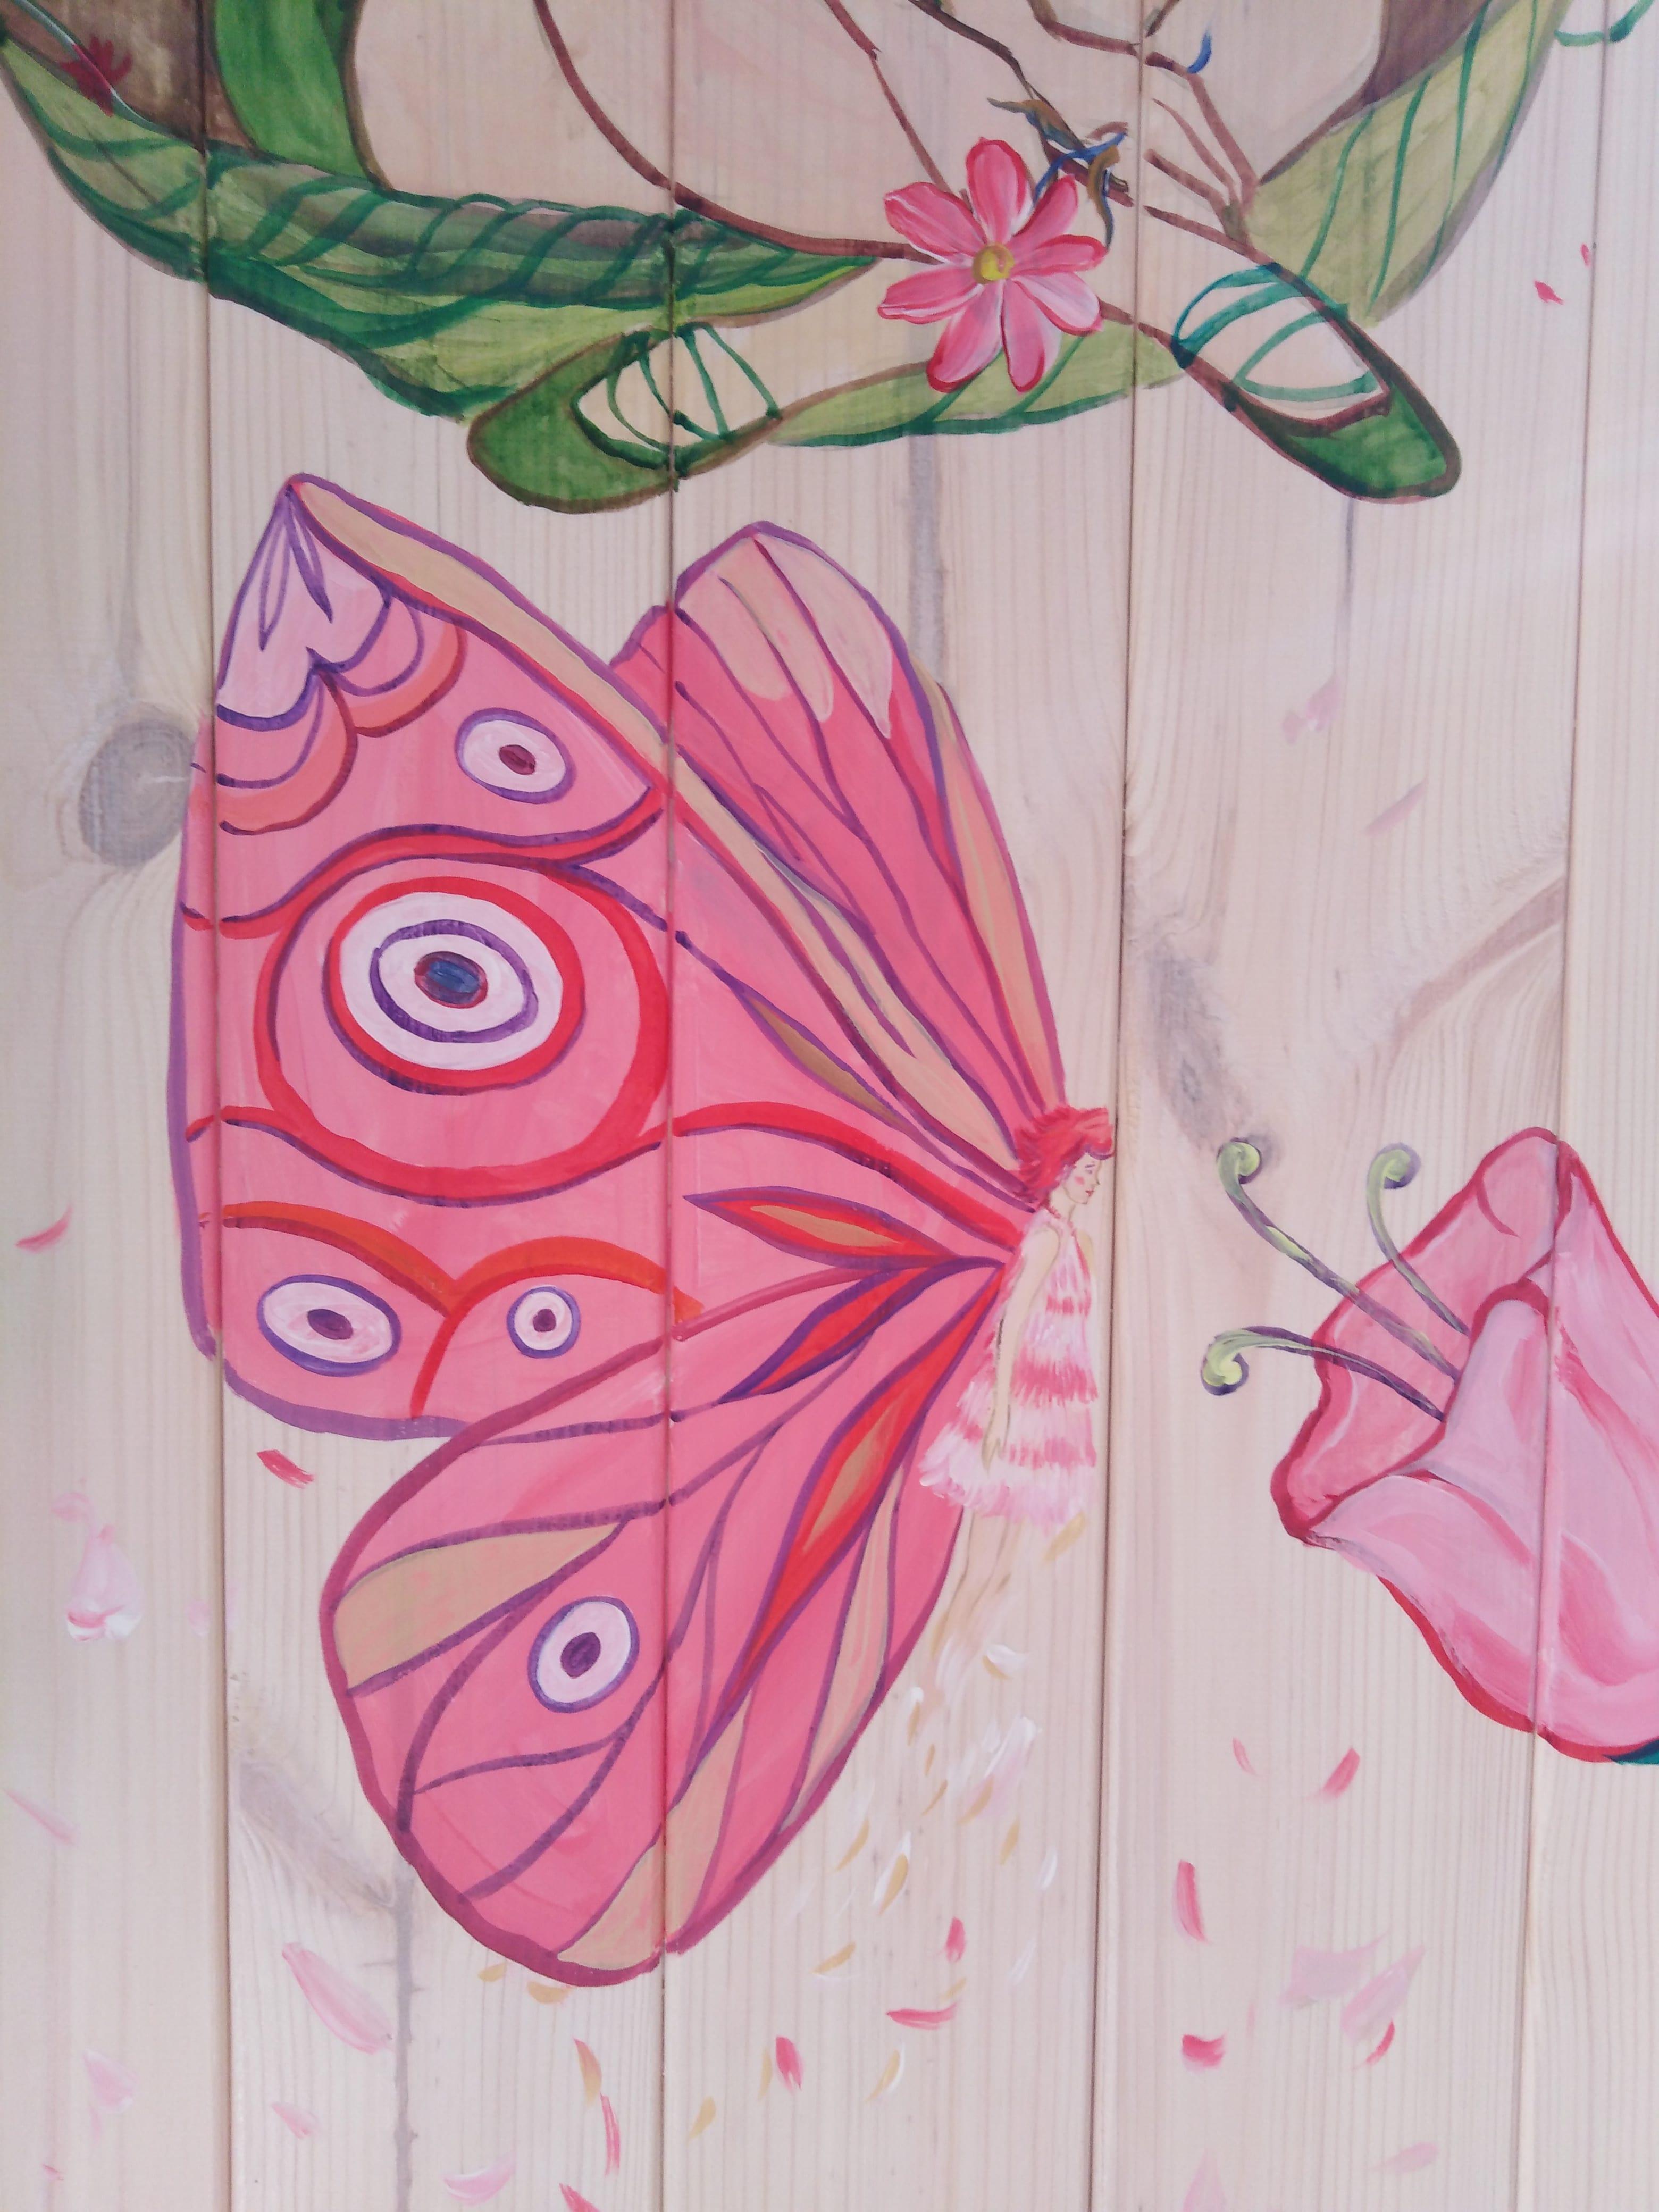 <p>Painting the children's room</p>